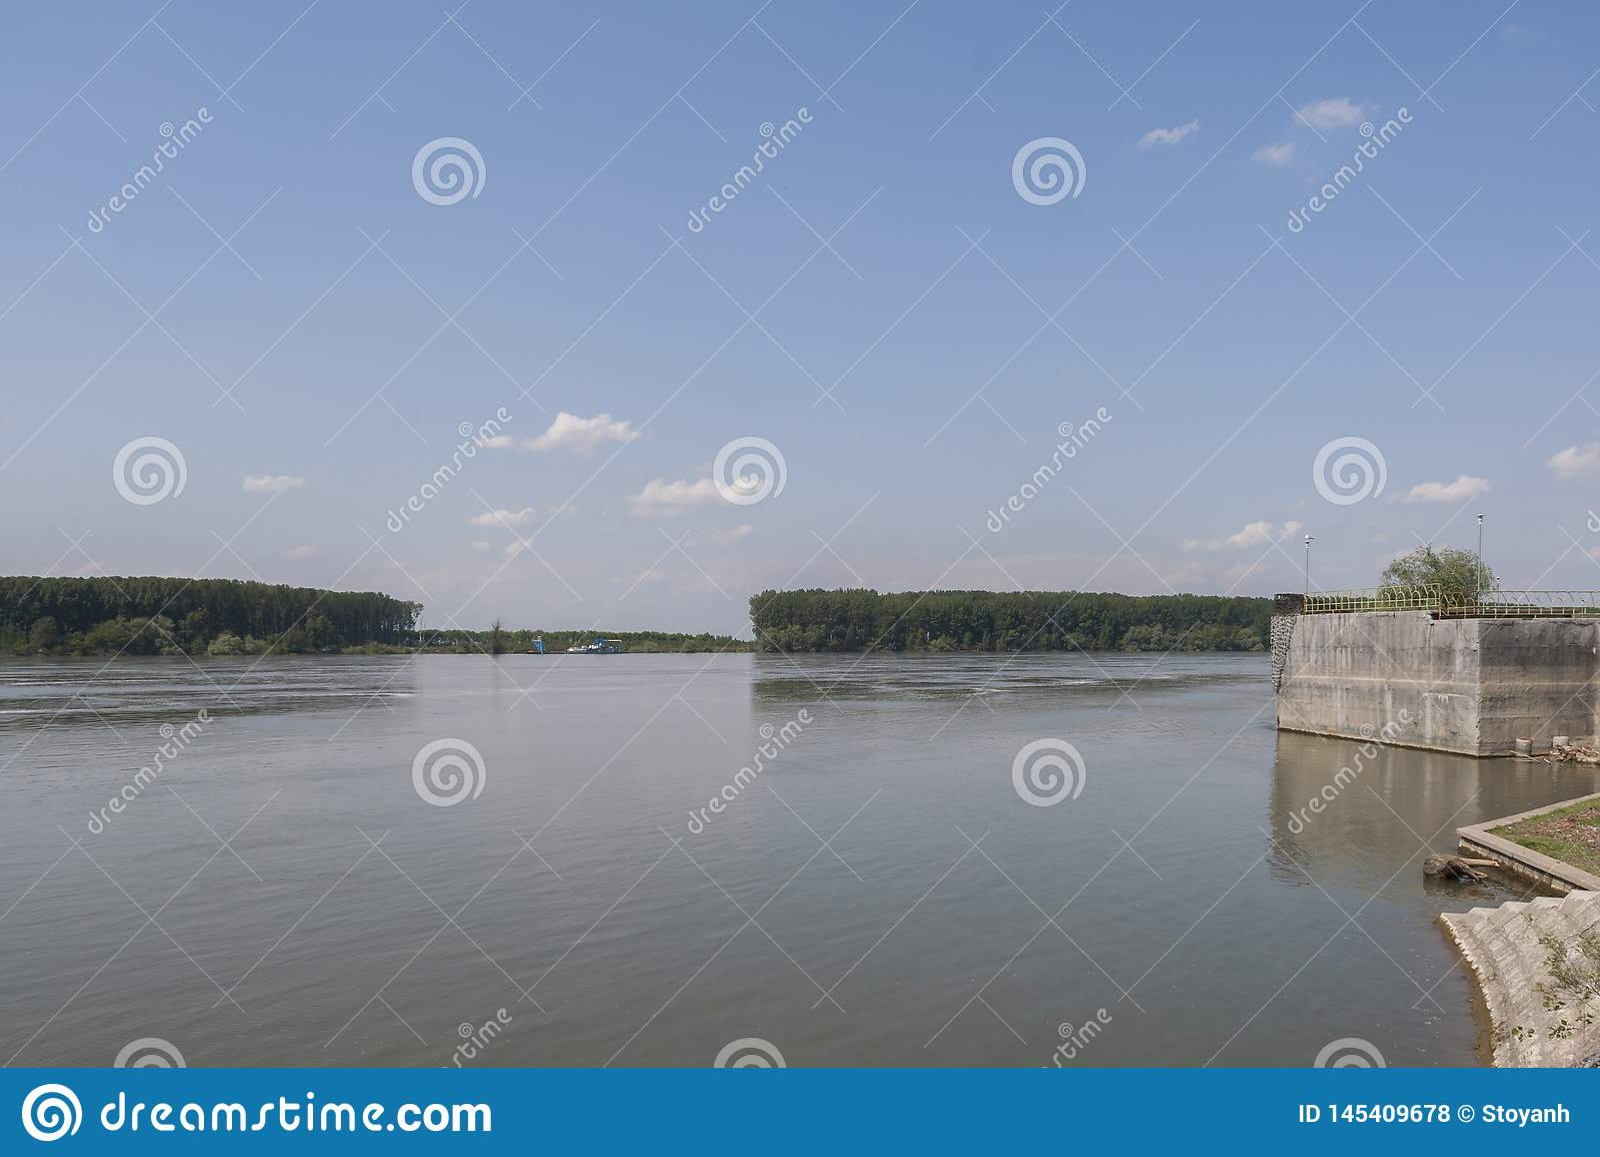 Danube River, passing through the town of Silistra, Bulgaria